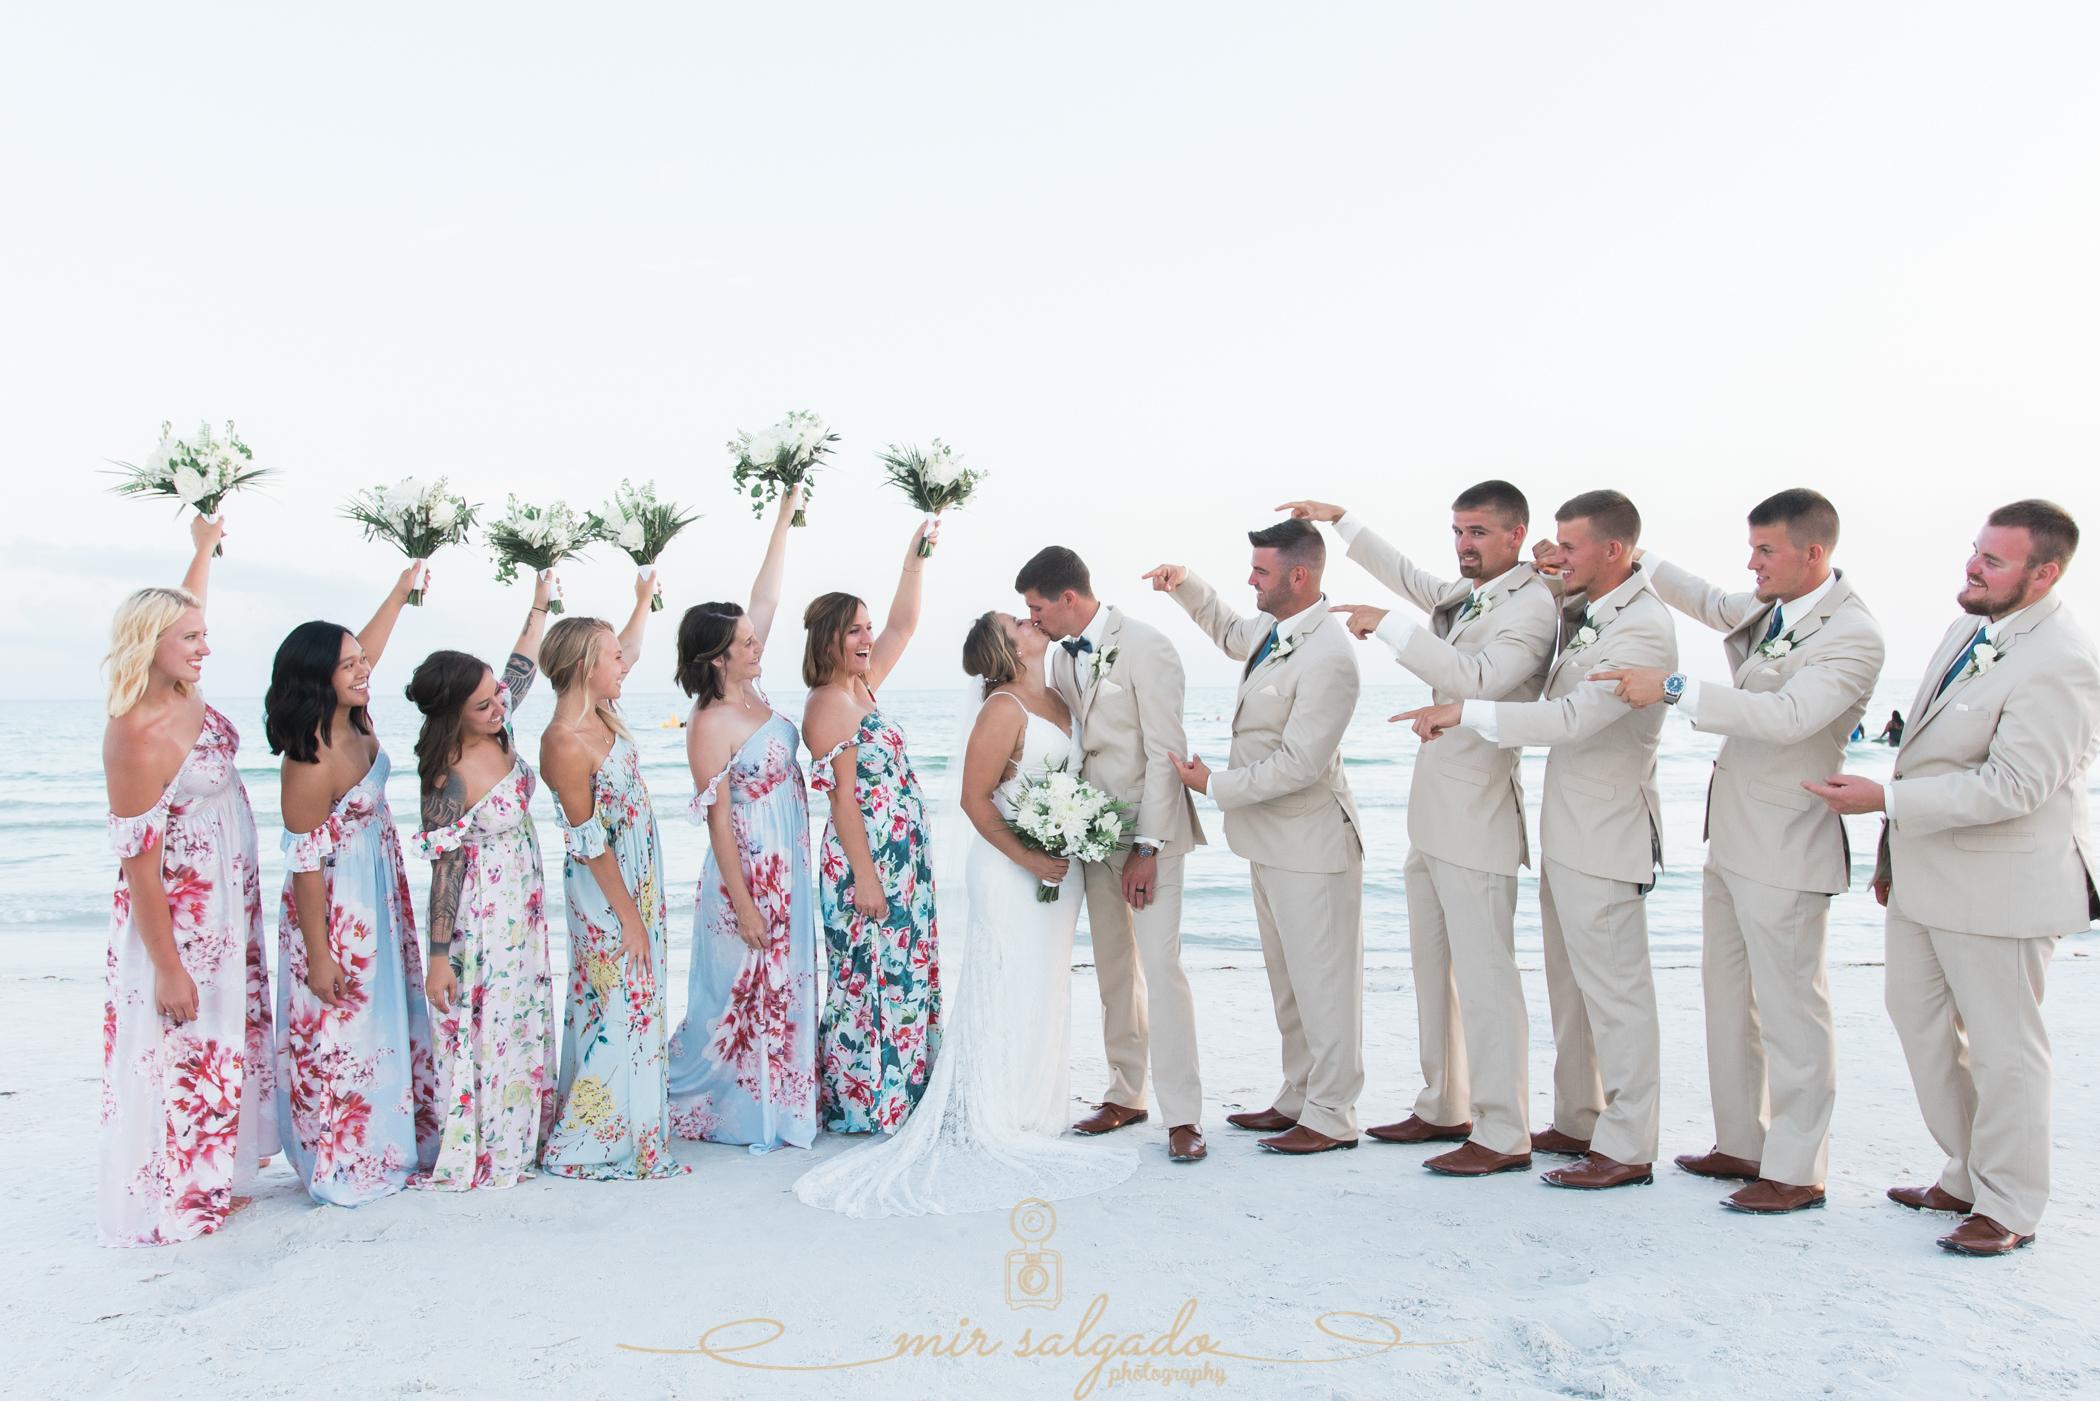 Bridal-party-photo, Sarasota-wedding-photographer